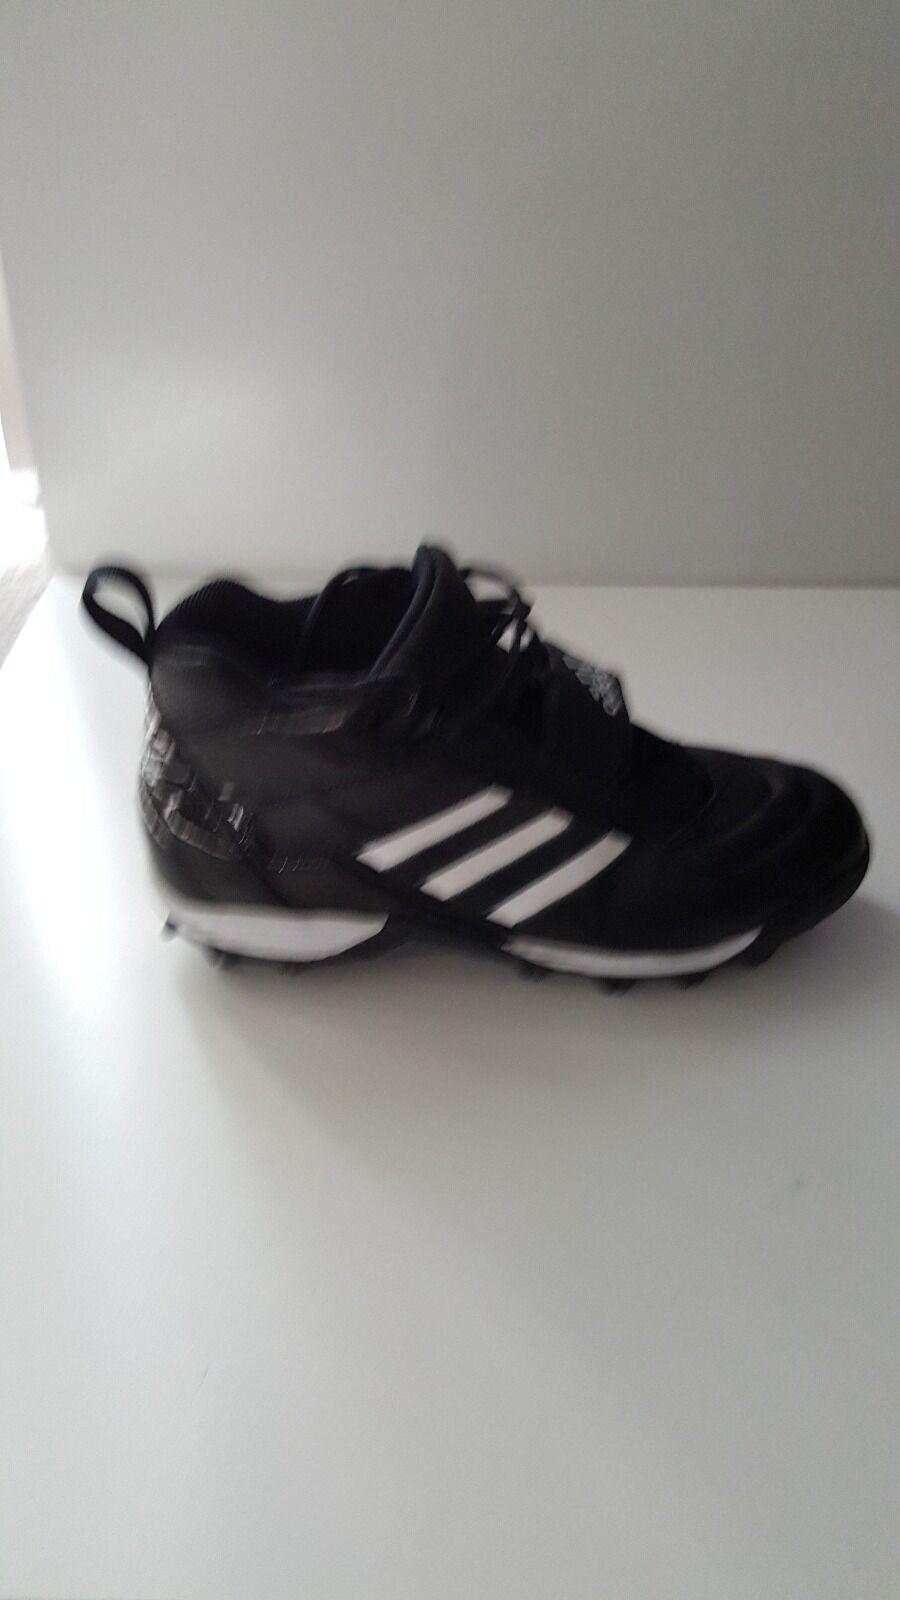 sports shoes 66c0a 1de7b ... Adidas Football Football Football Cleats Shoes Size 12 22e247 ...